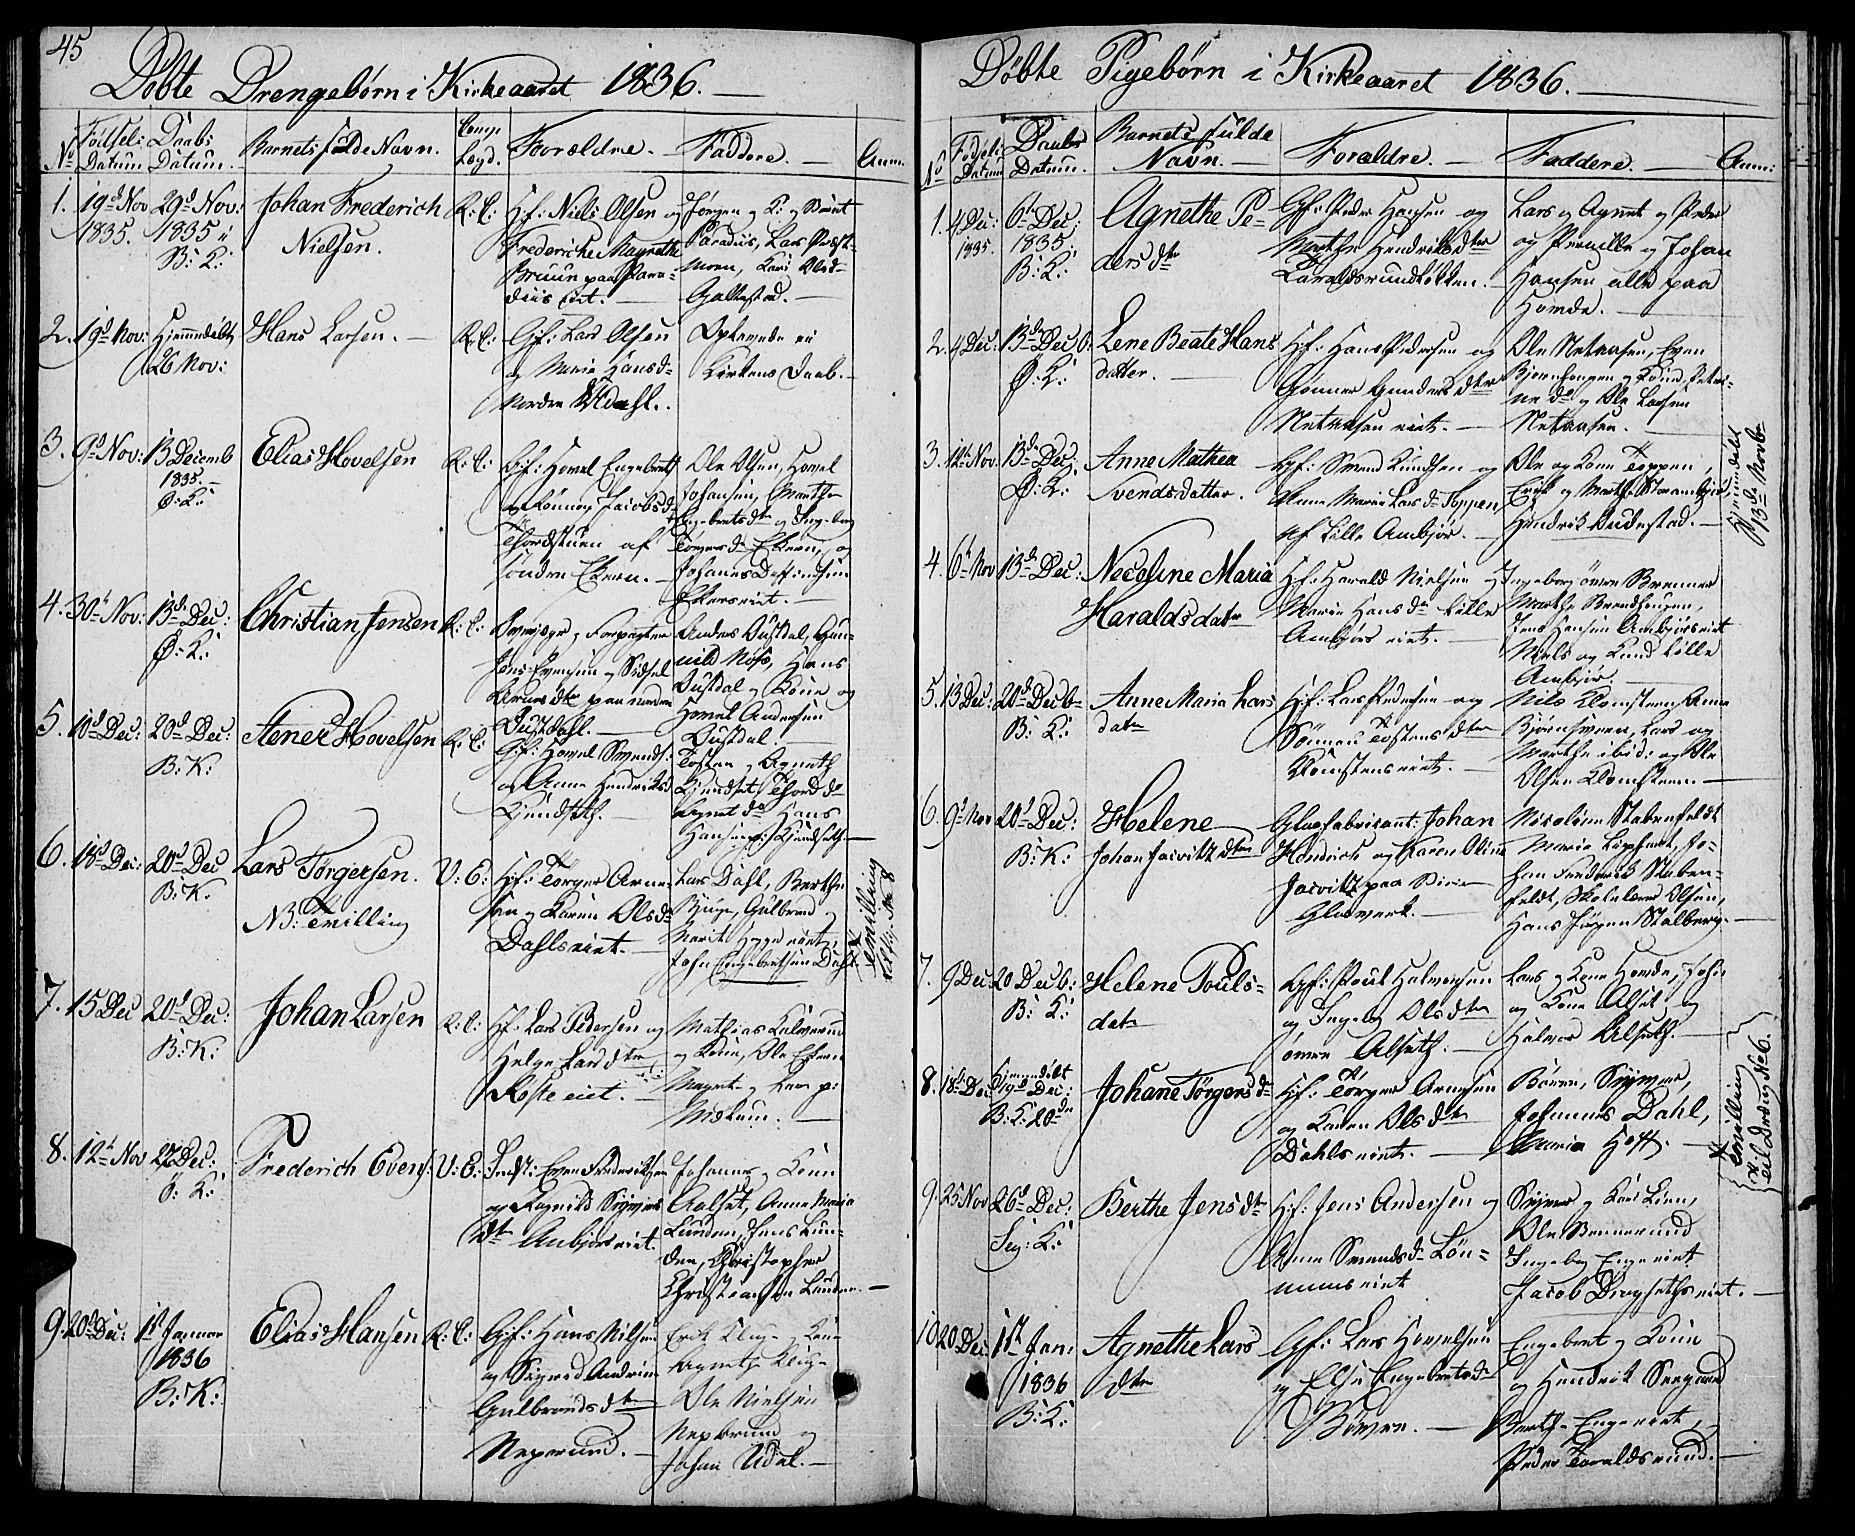 SAH, Biri prestekontor, Klokkerbok nr. 2, 1828-1842, s. 45